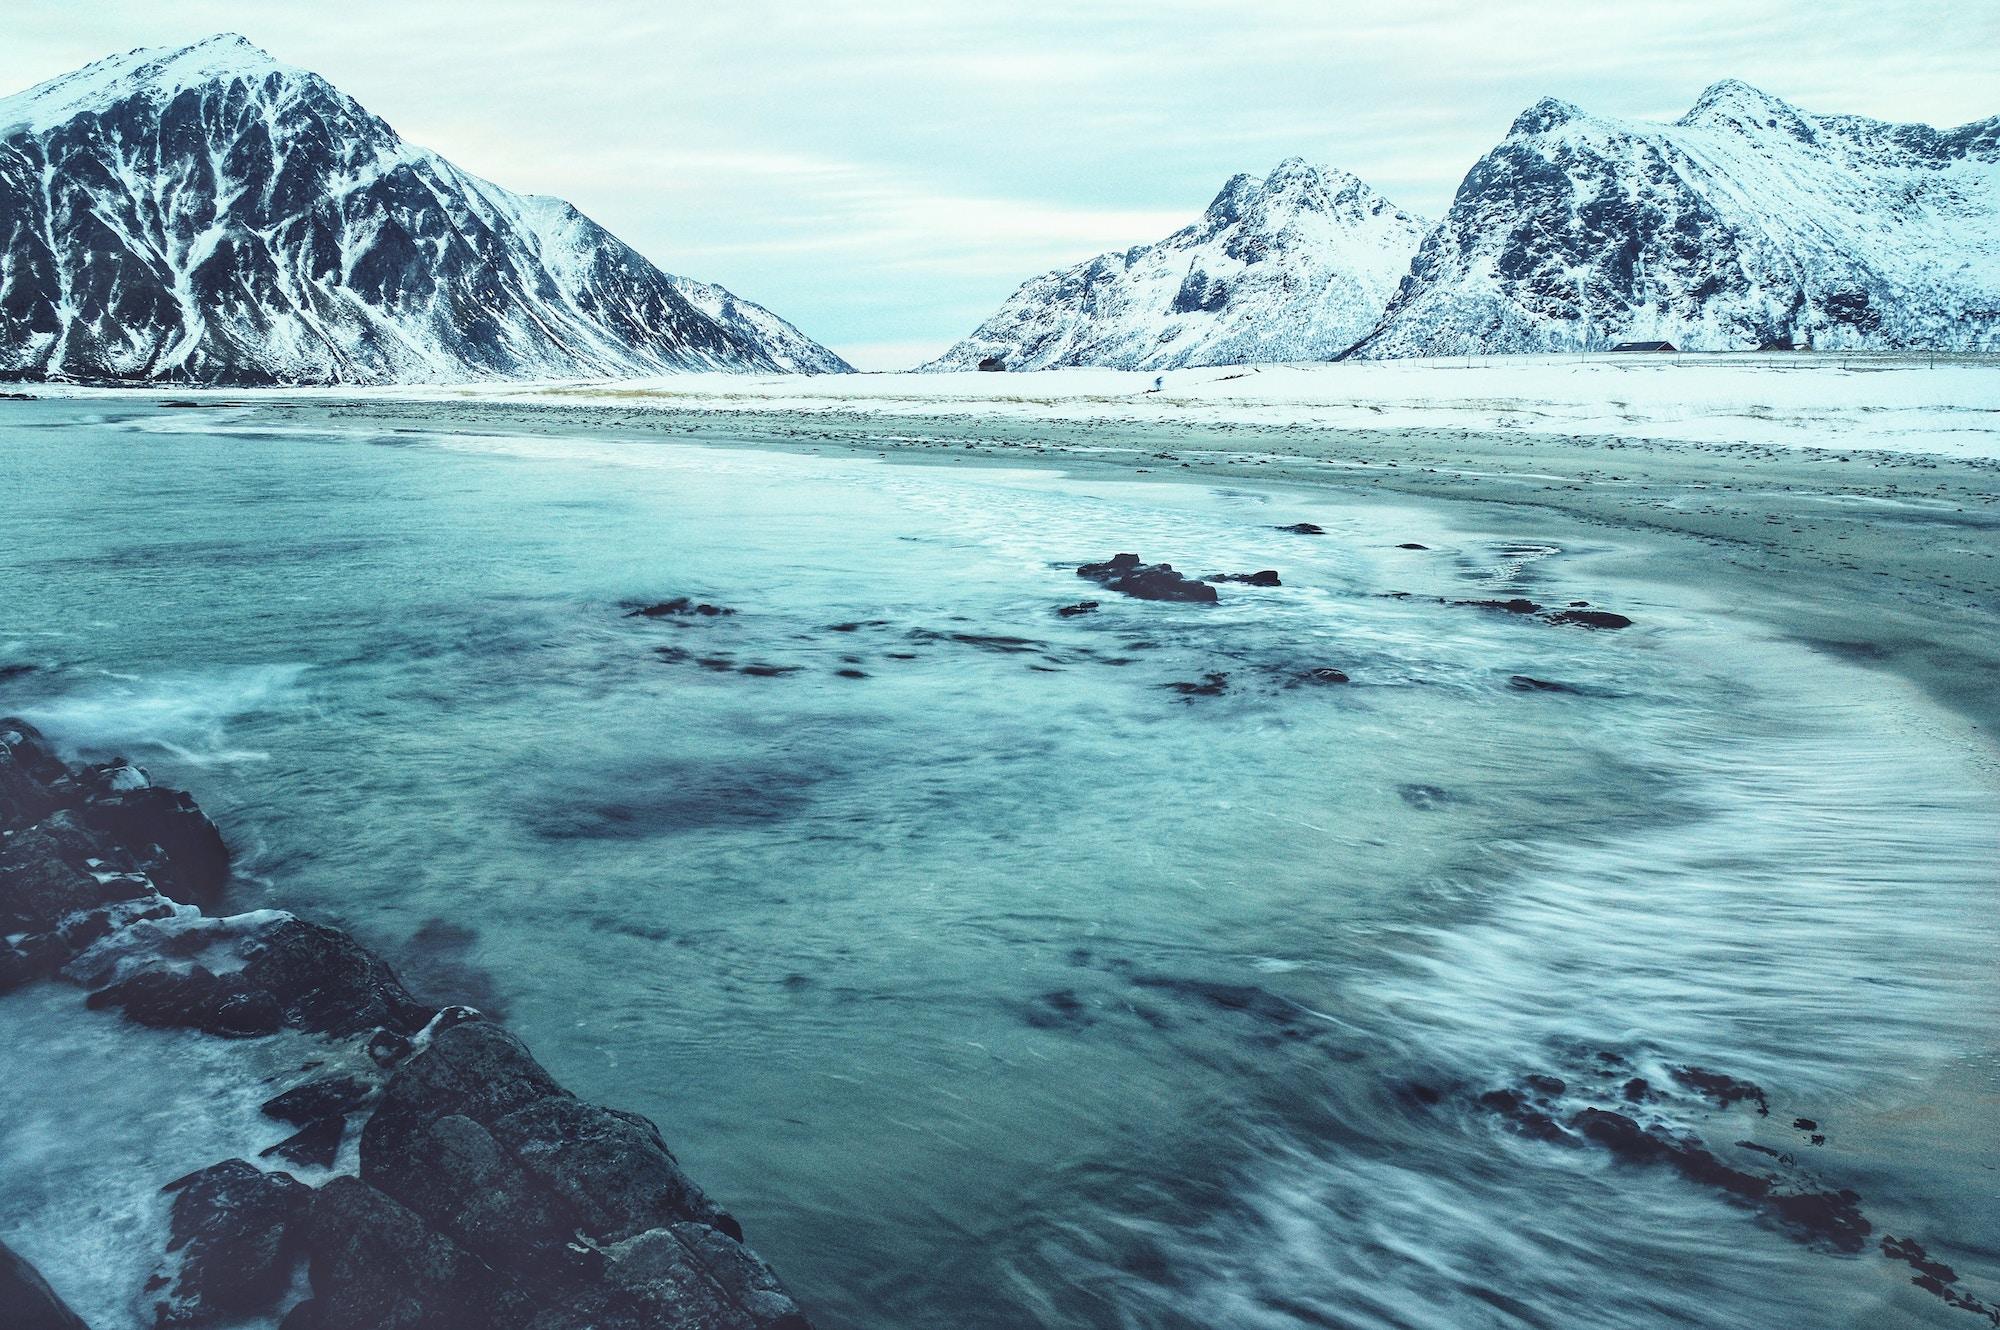 Arctic-sailing-expedition-4.jpg